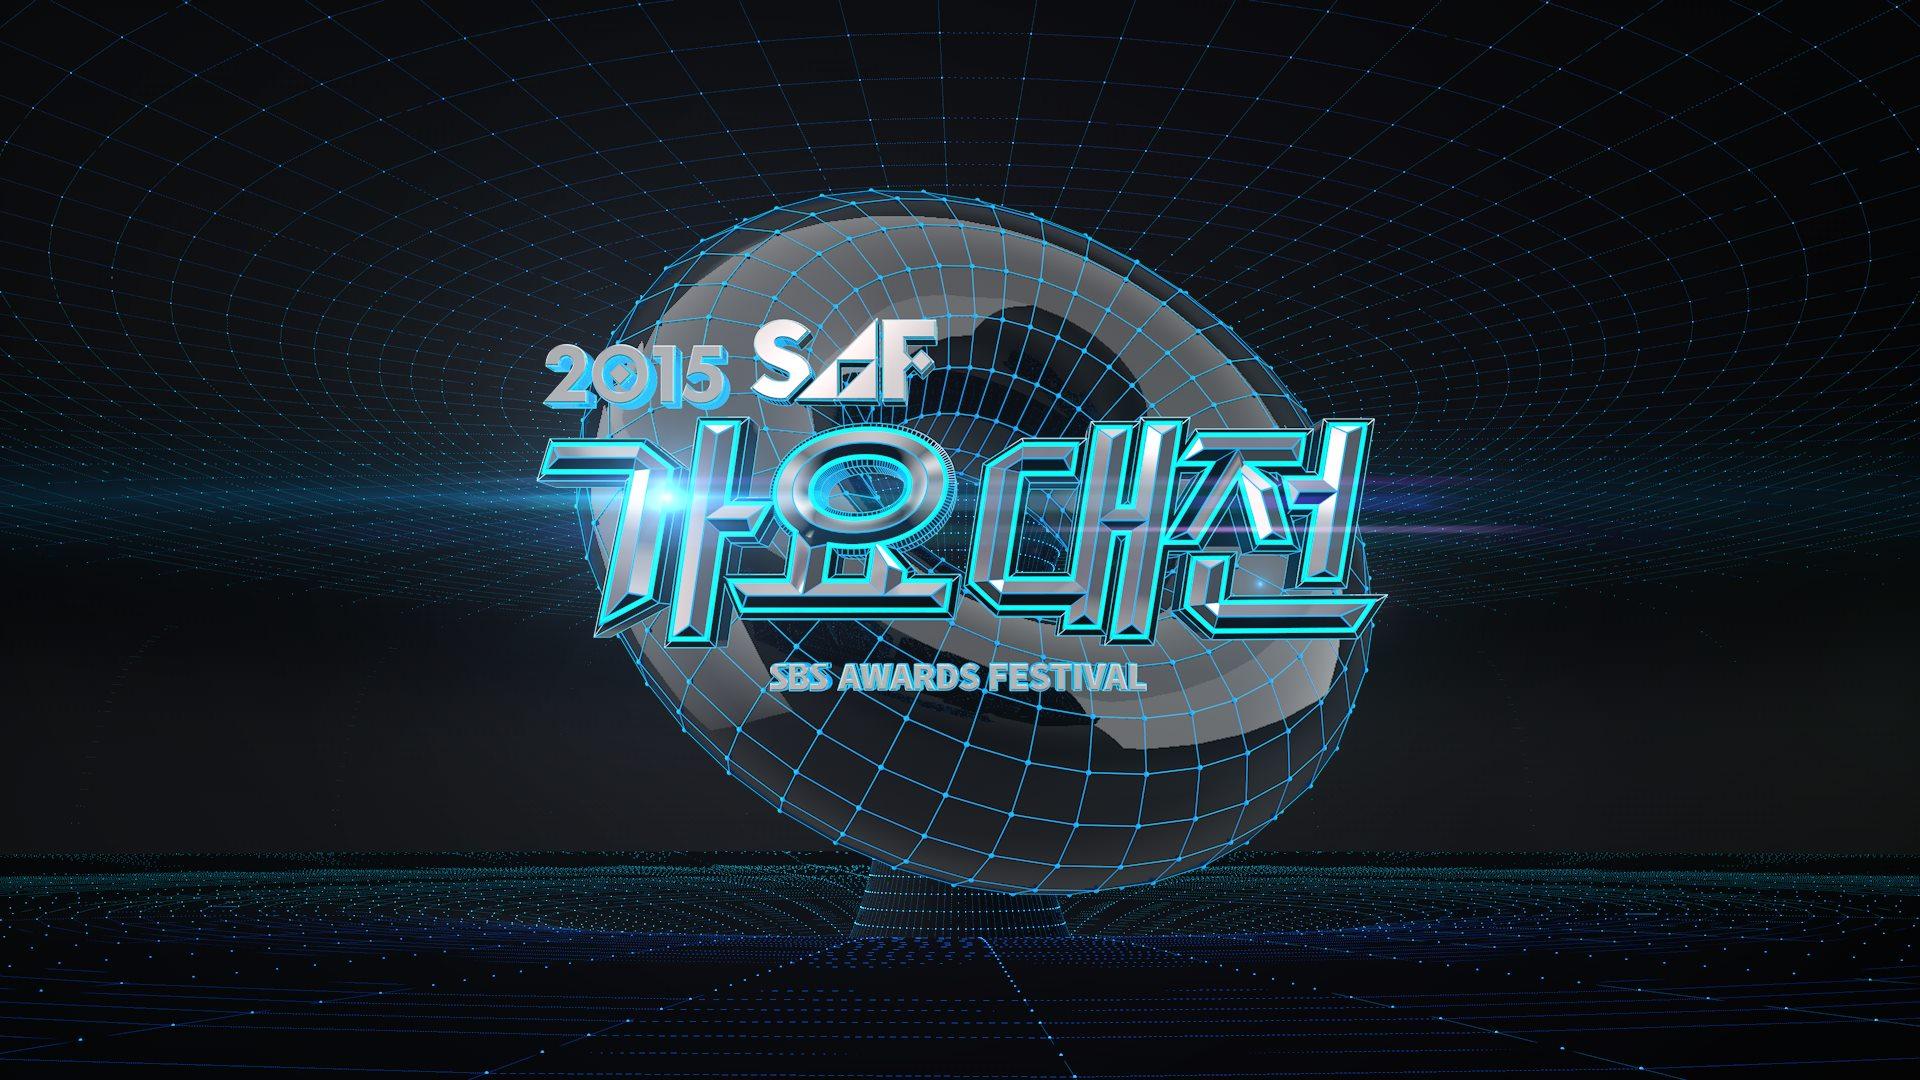 《SBS歌謠大戰》即將要在明天展開囉!去年SBS的「最佳樂團獎」得主是CNBLUE,今年得主究竟也會是他們嗎?!讓我們一起來看看今年的人氣樂隊組合有哪幾組吧!(*゚∀゚*)